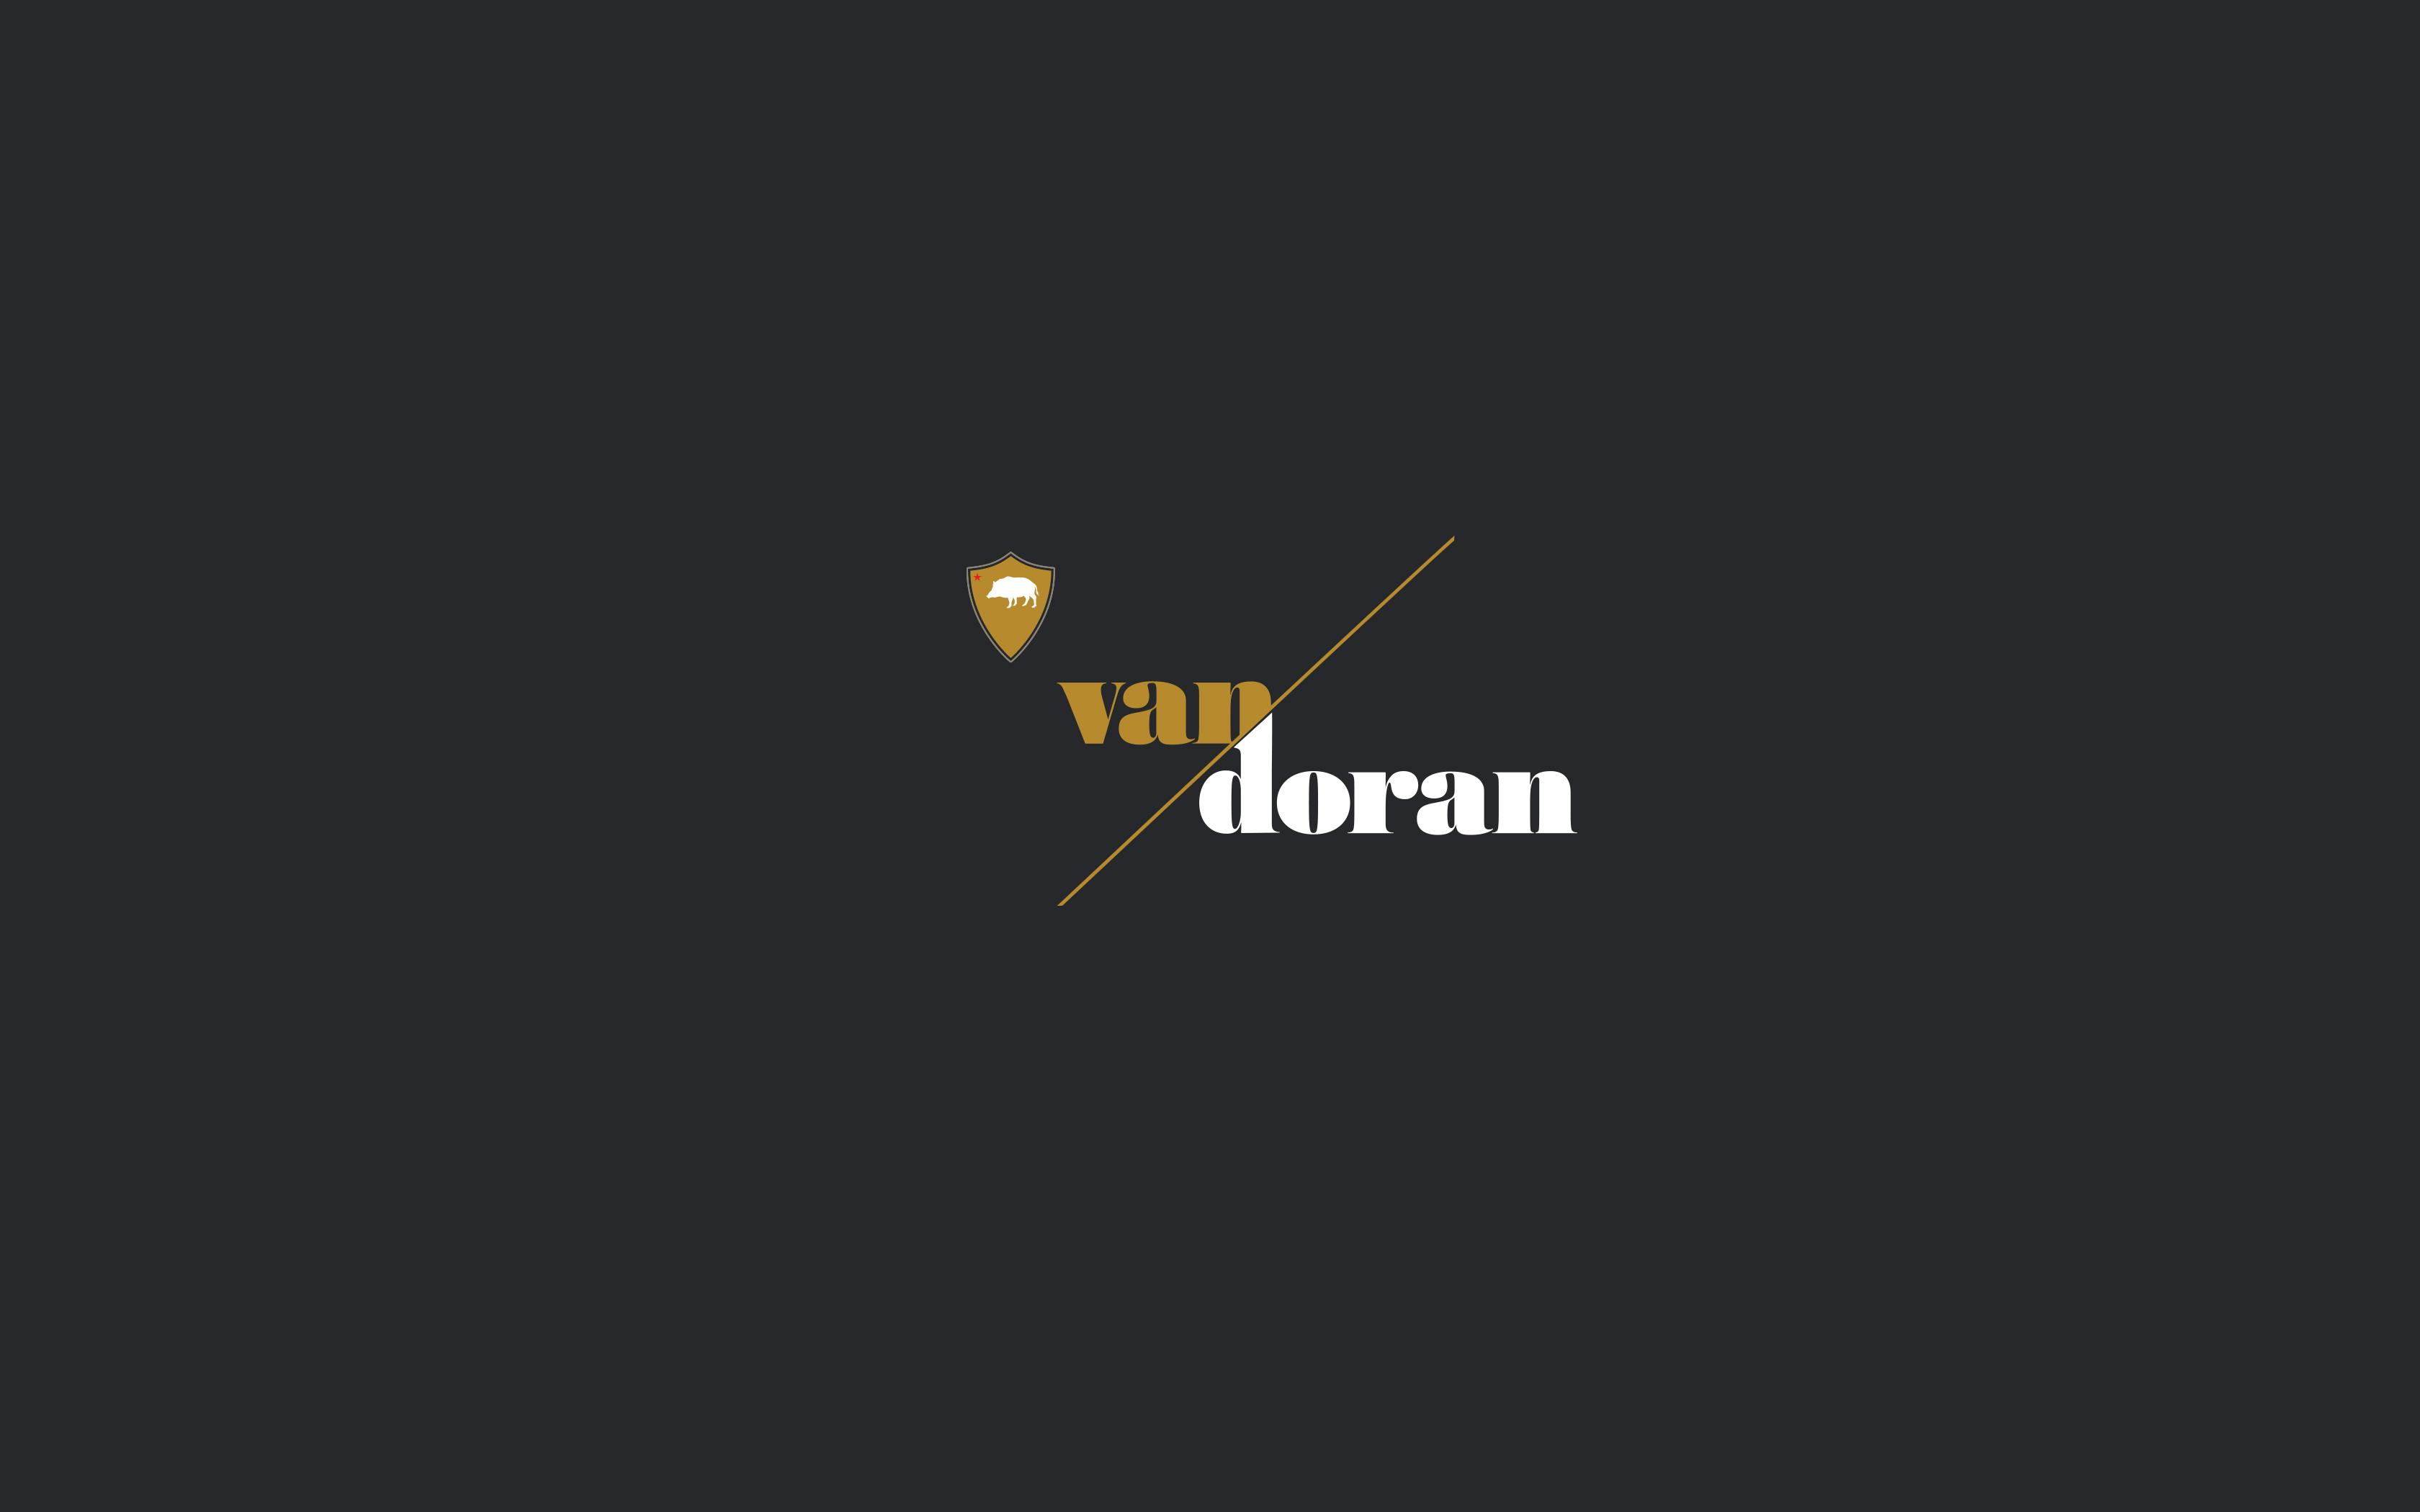 van_doran_X_MAMUS_CREATIVE_1